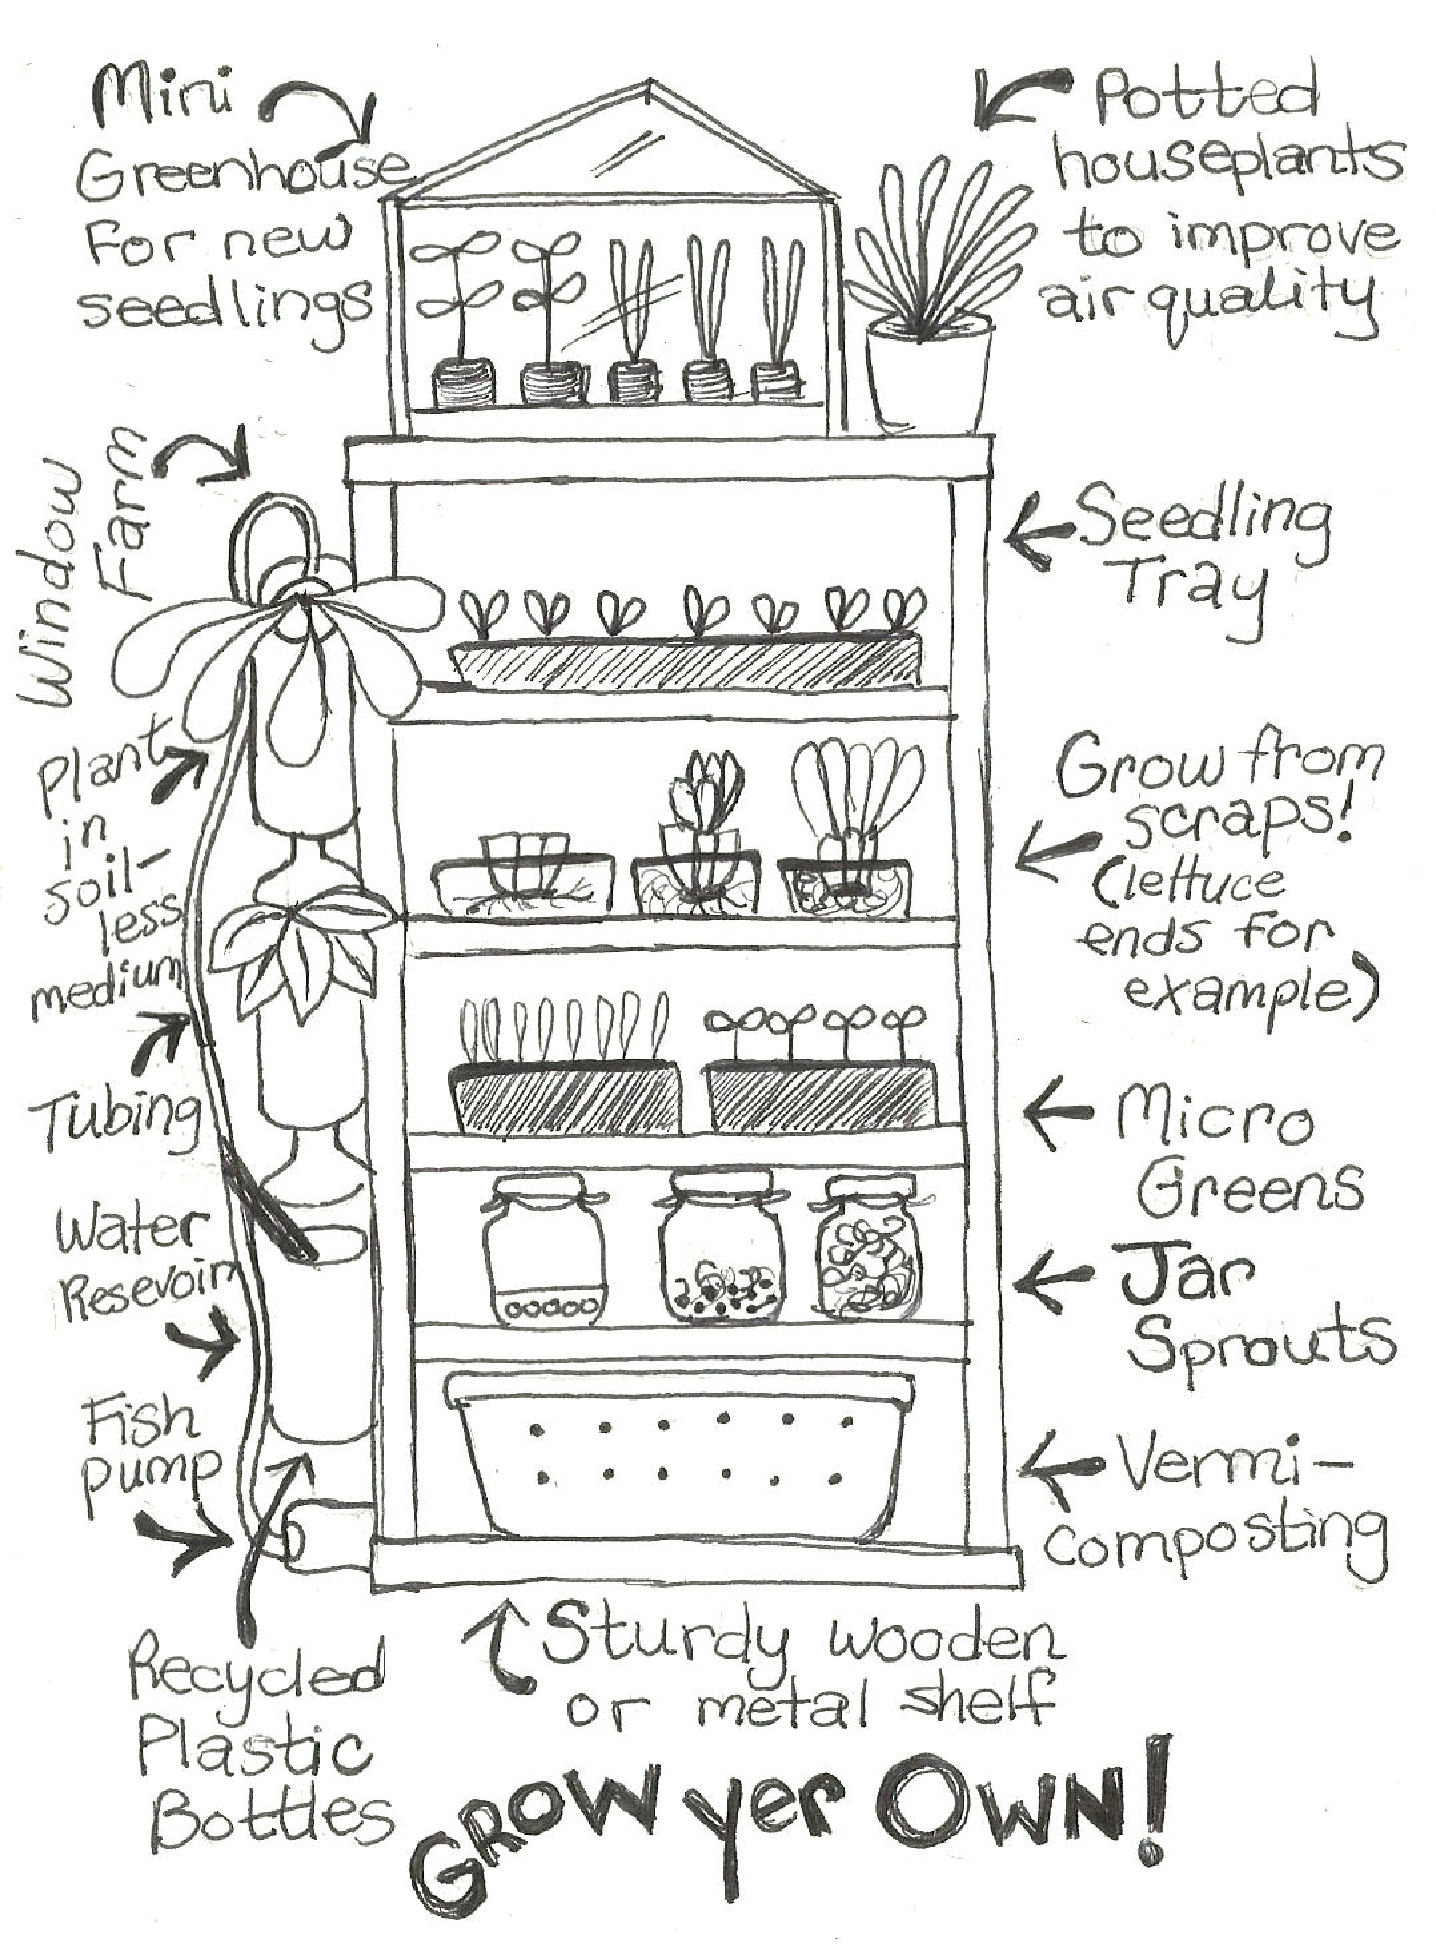 The greenhouse collective - Indoor Growing Shelf